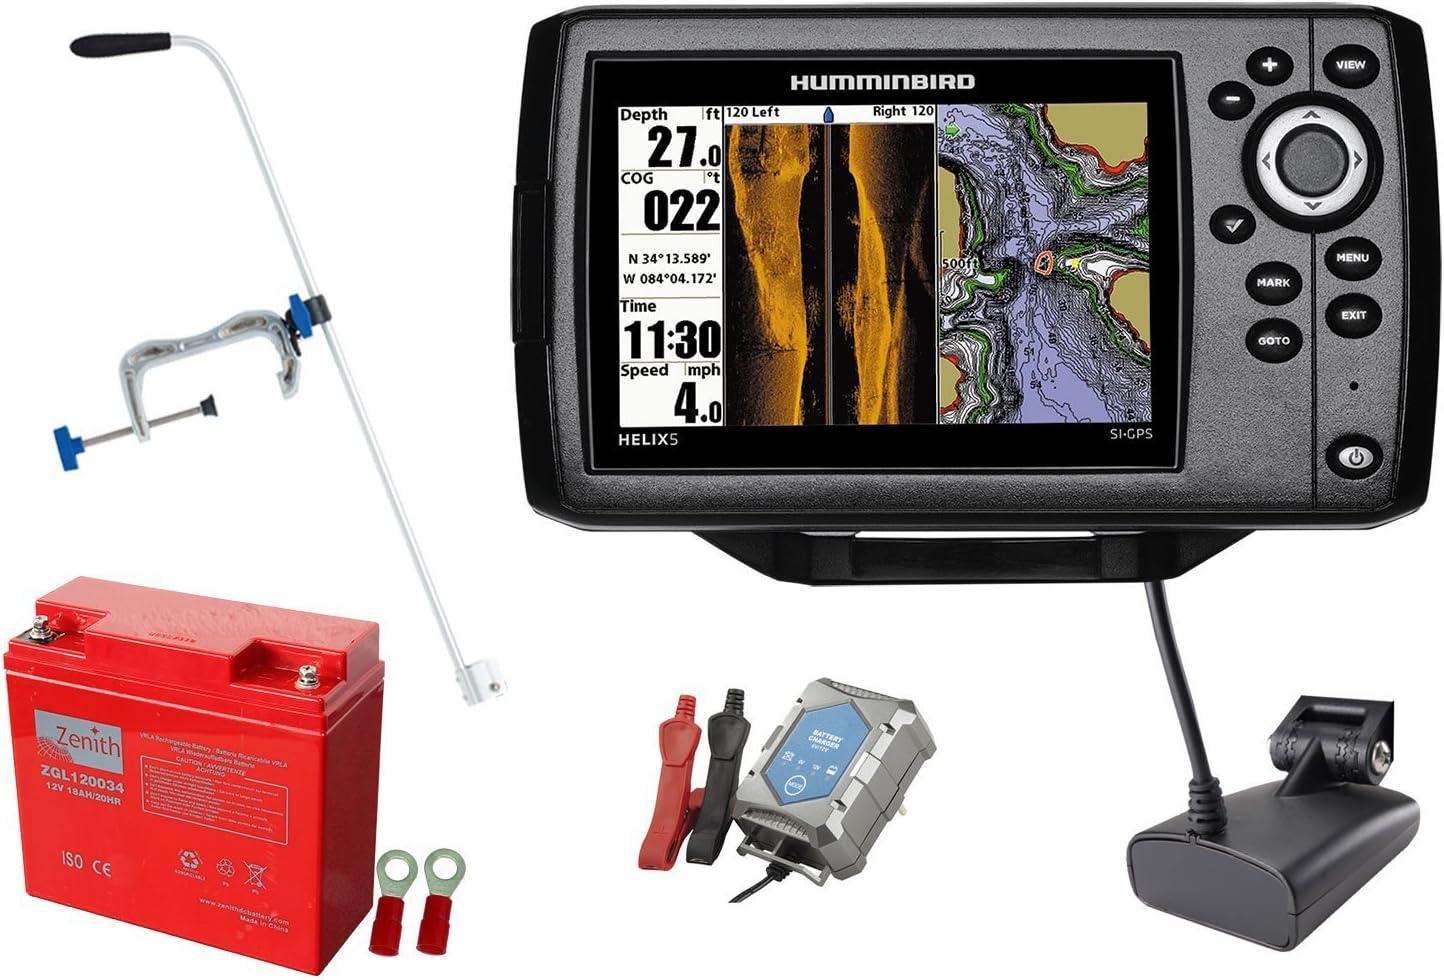 Hélice Humminbird sonar 5 SI GPS (83/200 + 455 kHz) portátil ...